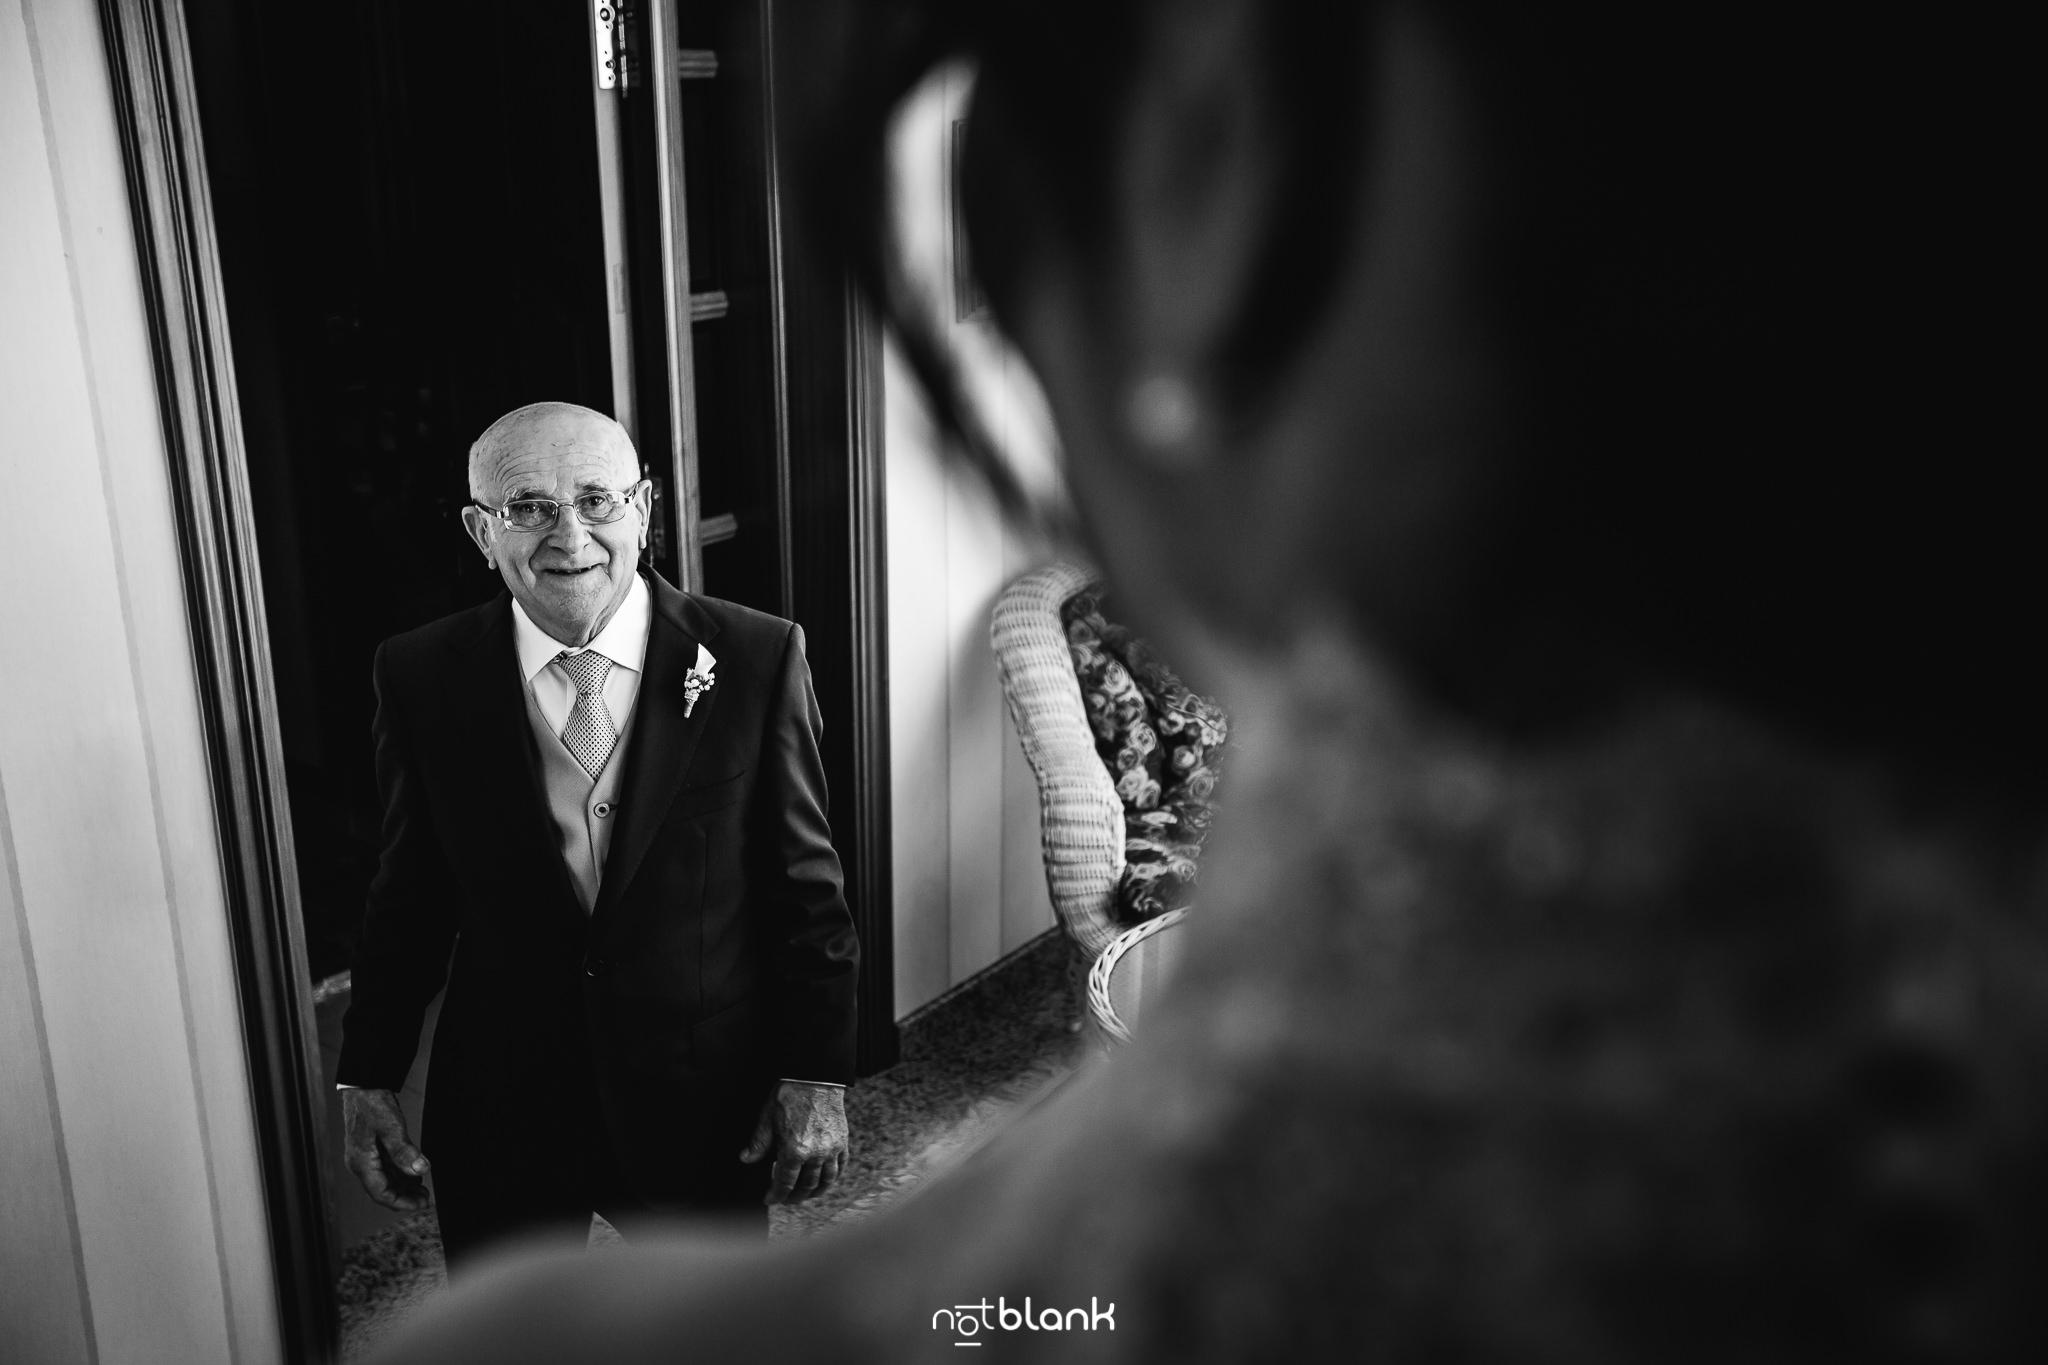 Boda-Maite-David-Primera-Mirada-Padre-A-Hija-Vestida-De-Novia. Reportaje realizado por Notblank fotógrafos de boda